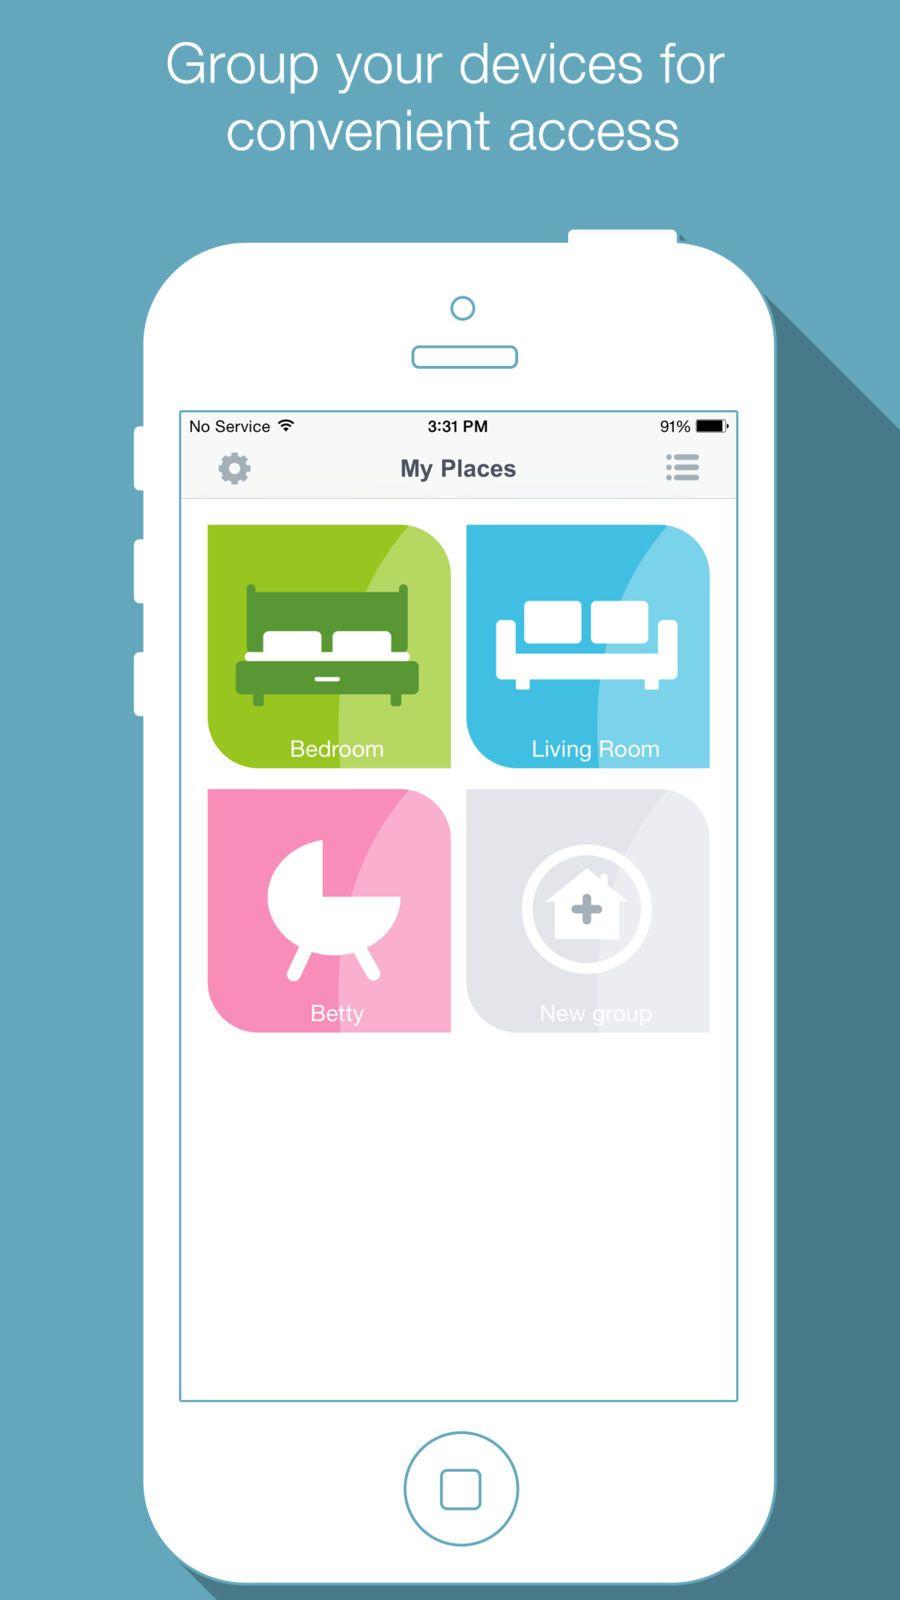 mydlink Home iosUtilitiesappapps App, Ipod touch, Ipad